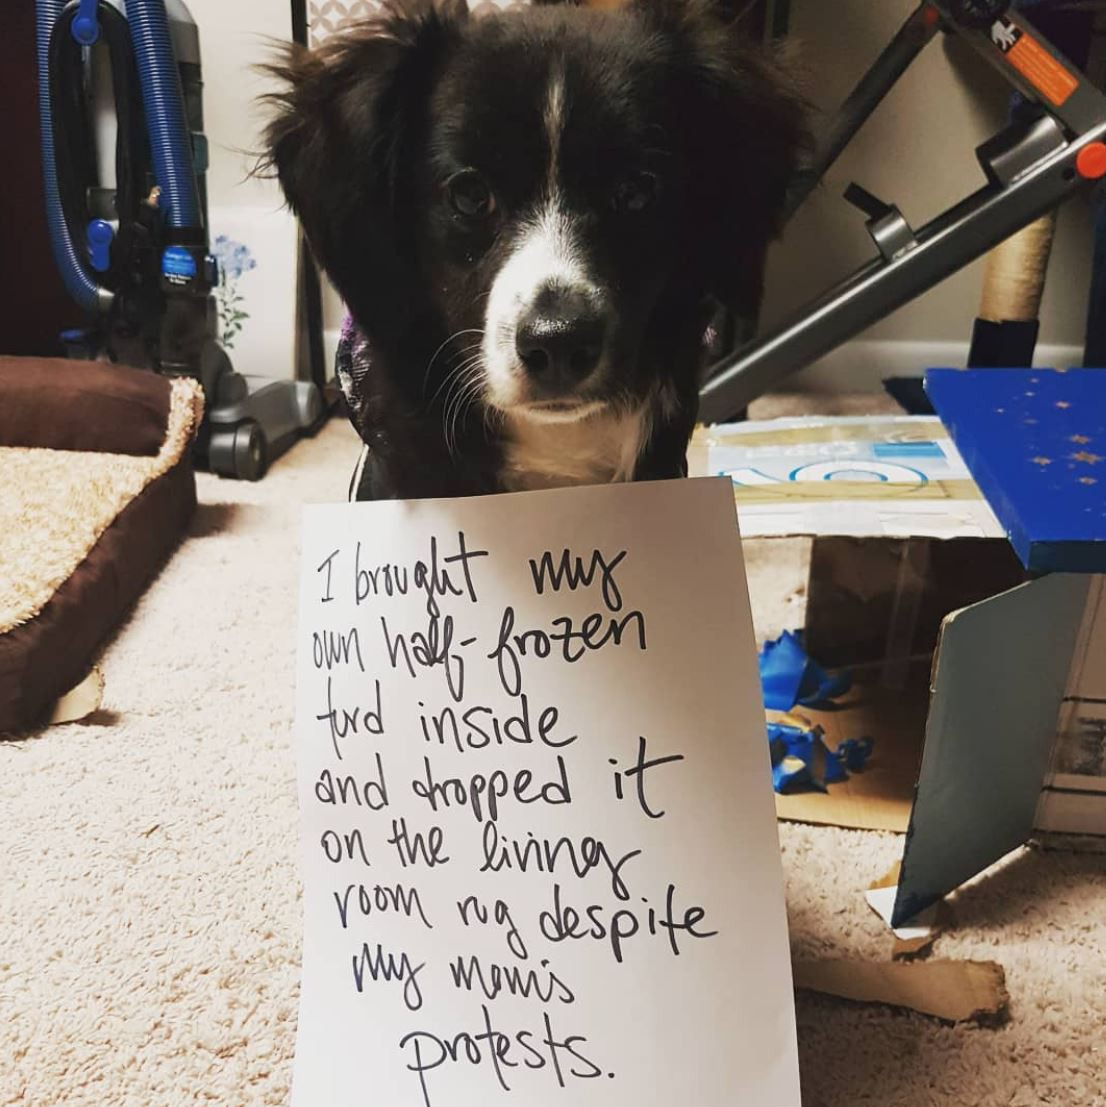 Smally furry white dog being dog shamed